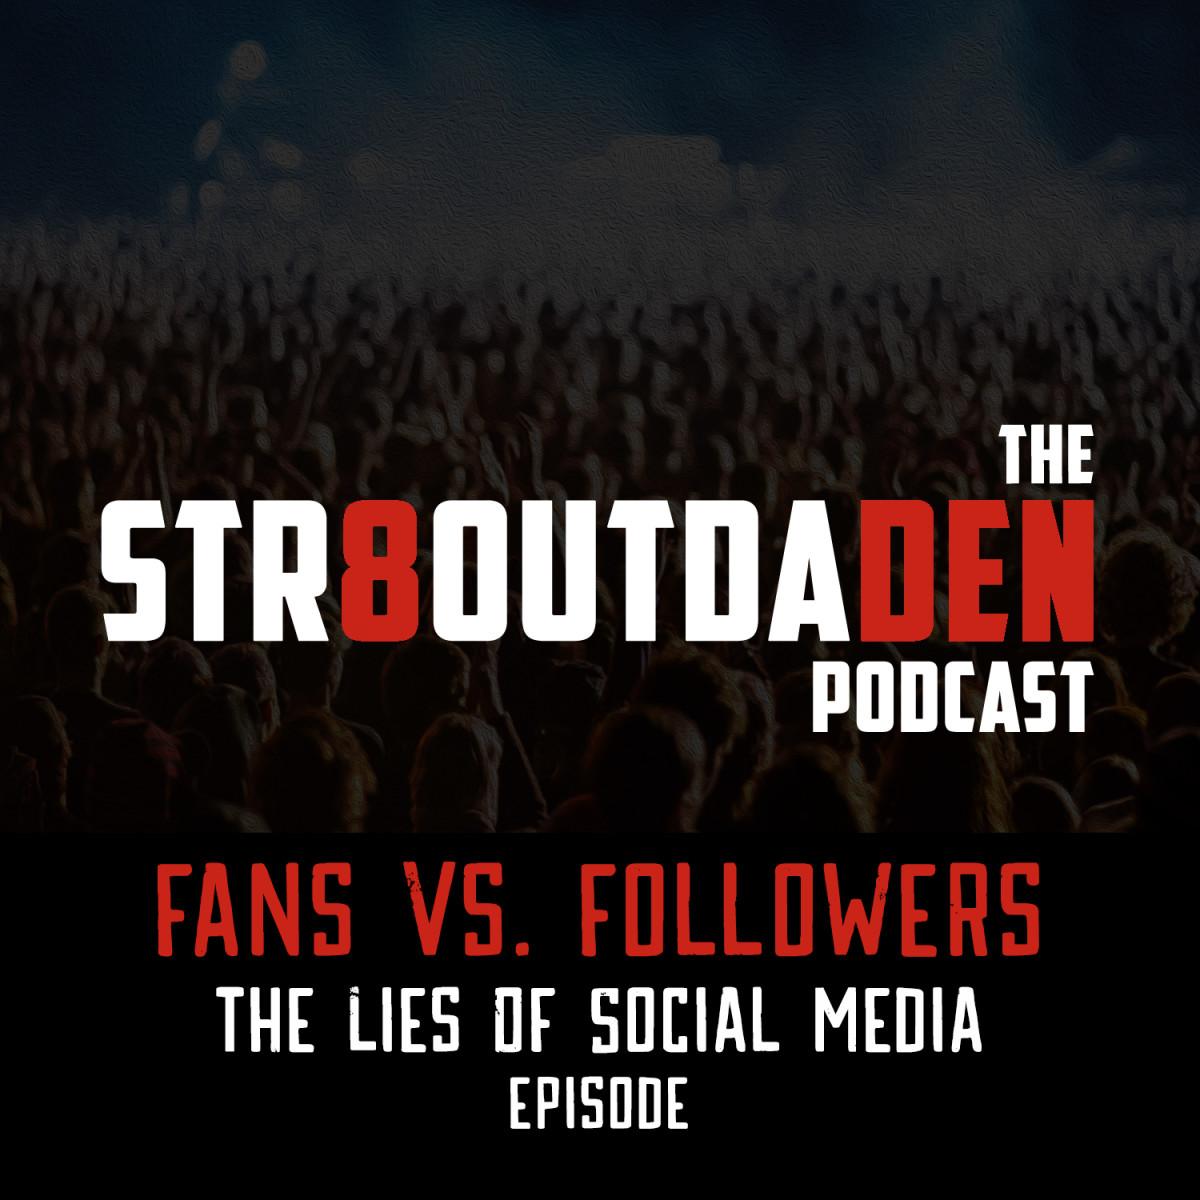 Fans vs. Followers - The Lies Of Social Media